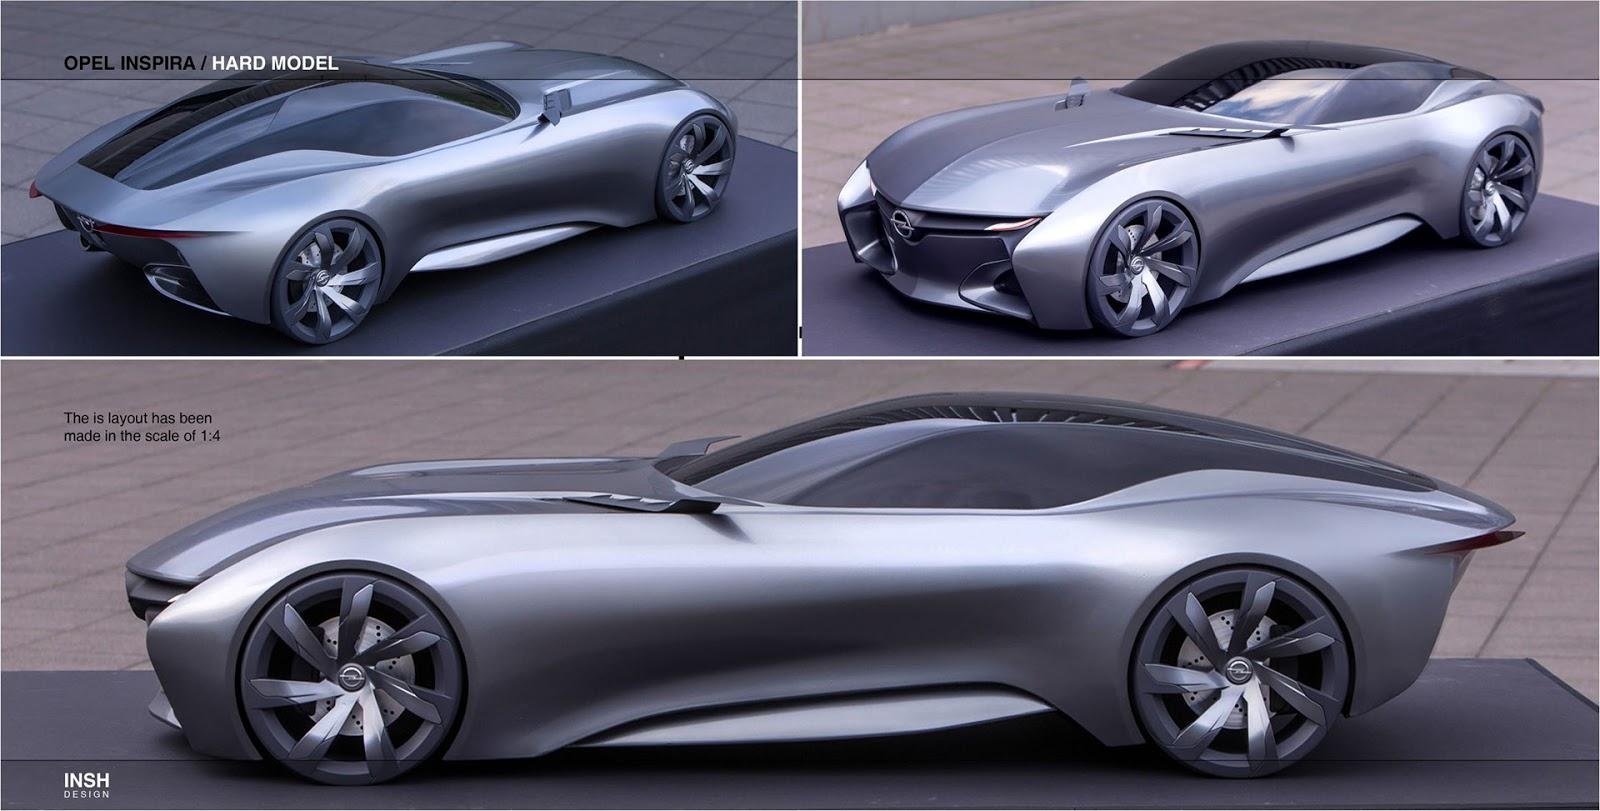 Opel Inspira Concept (1)